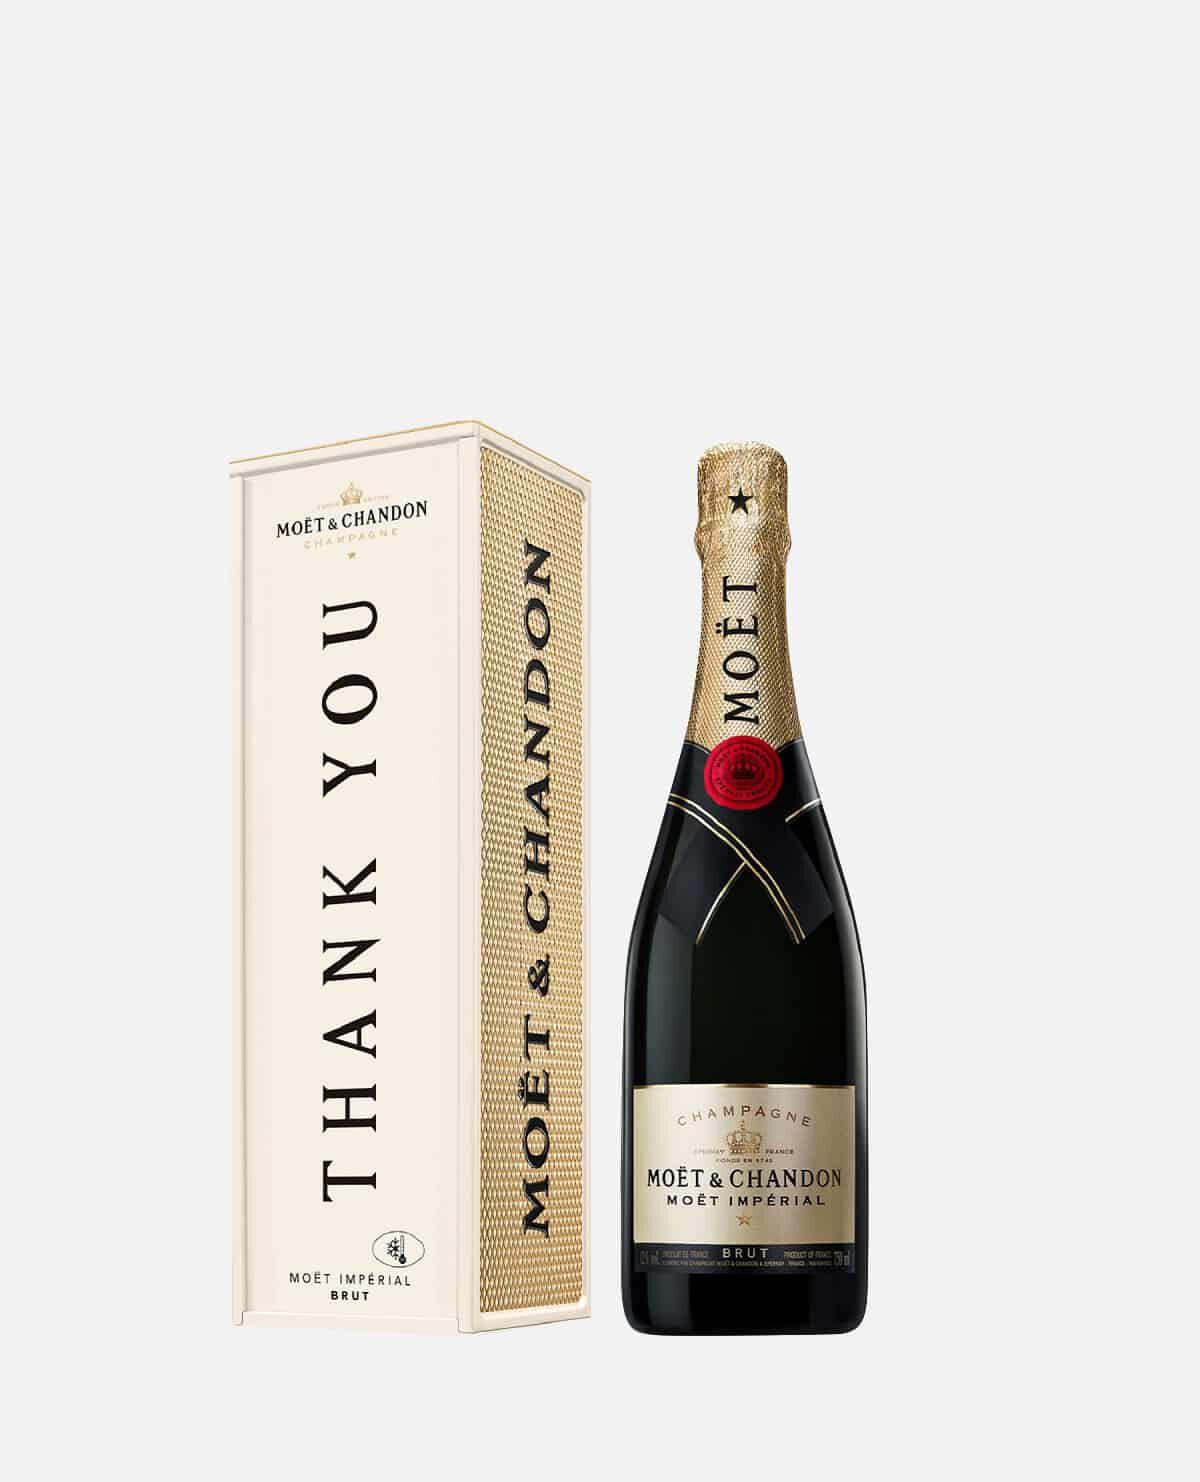 THANK YOUモエ アンペリアル シャンパン